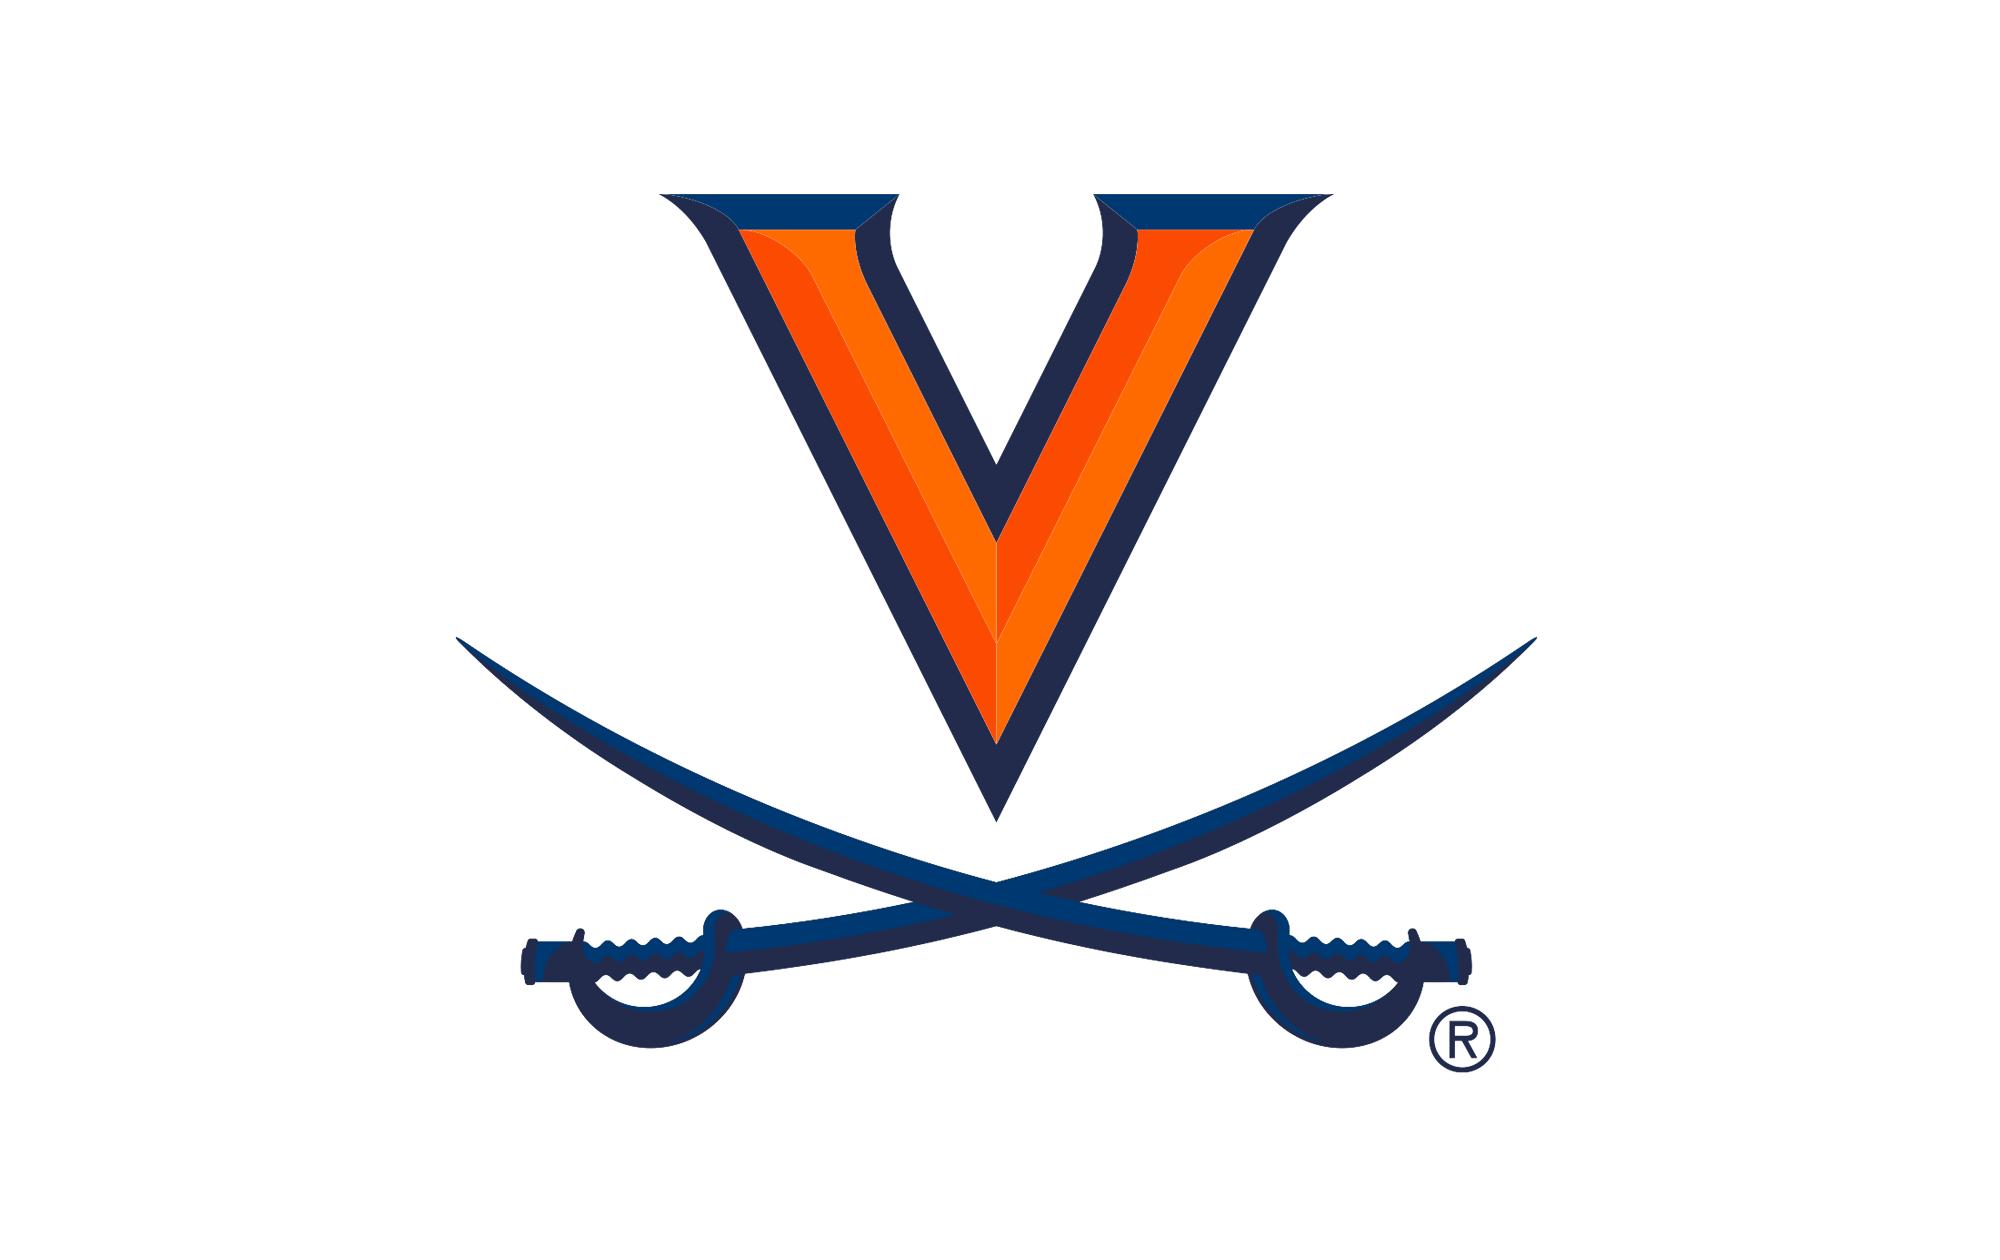 New Logos for Virginia Athletics by Nike GIG